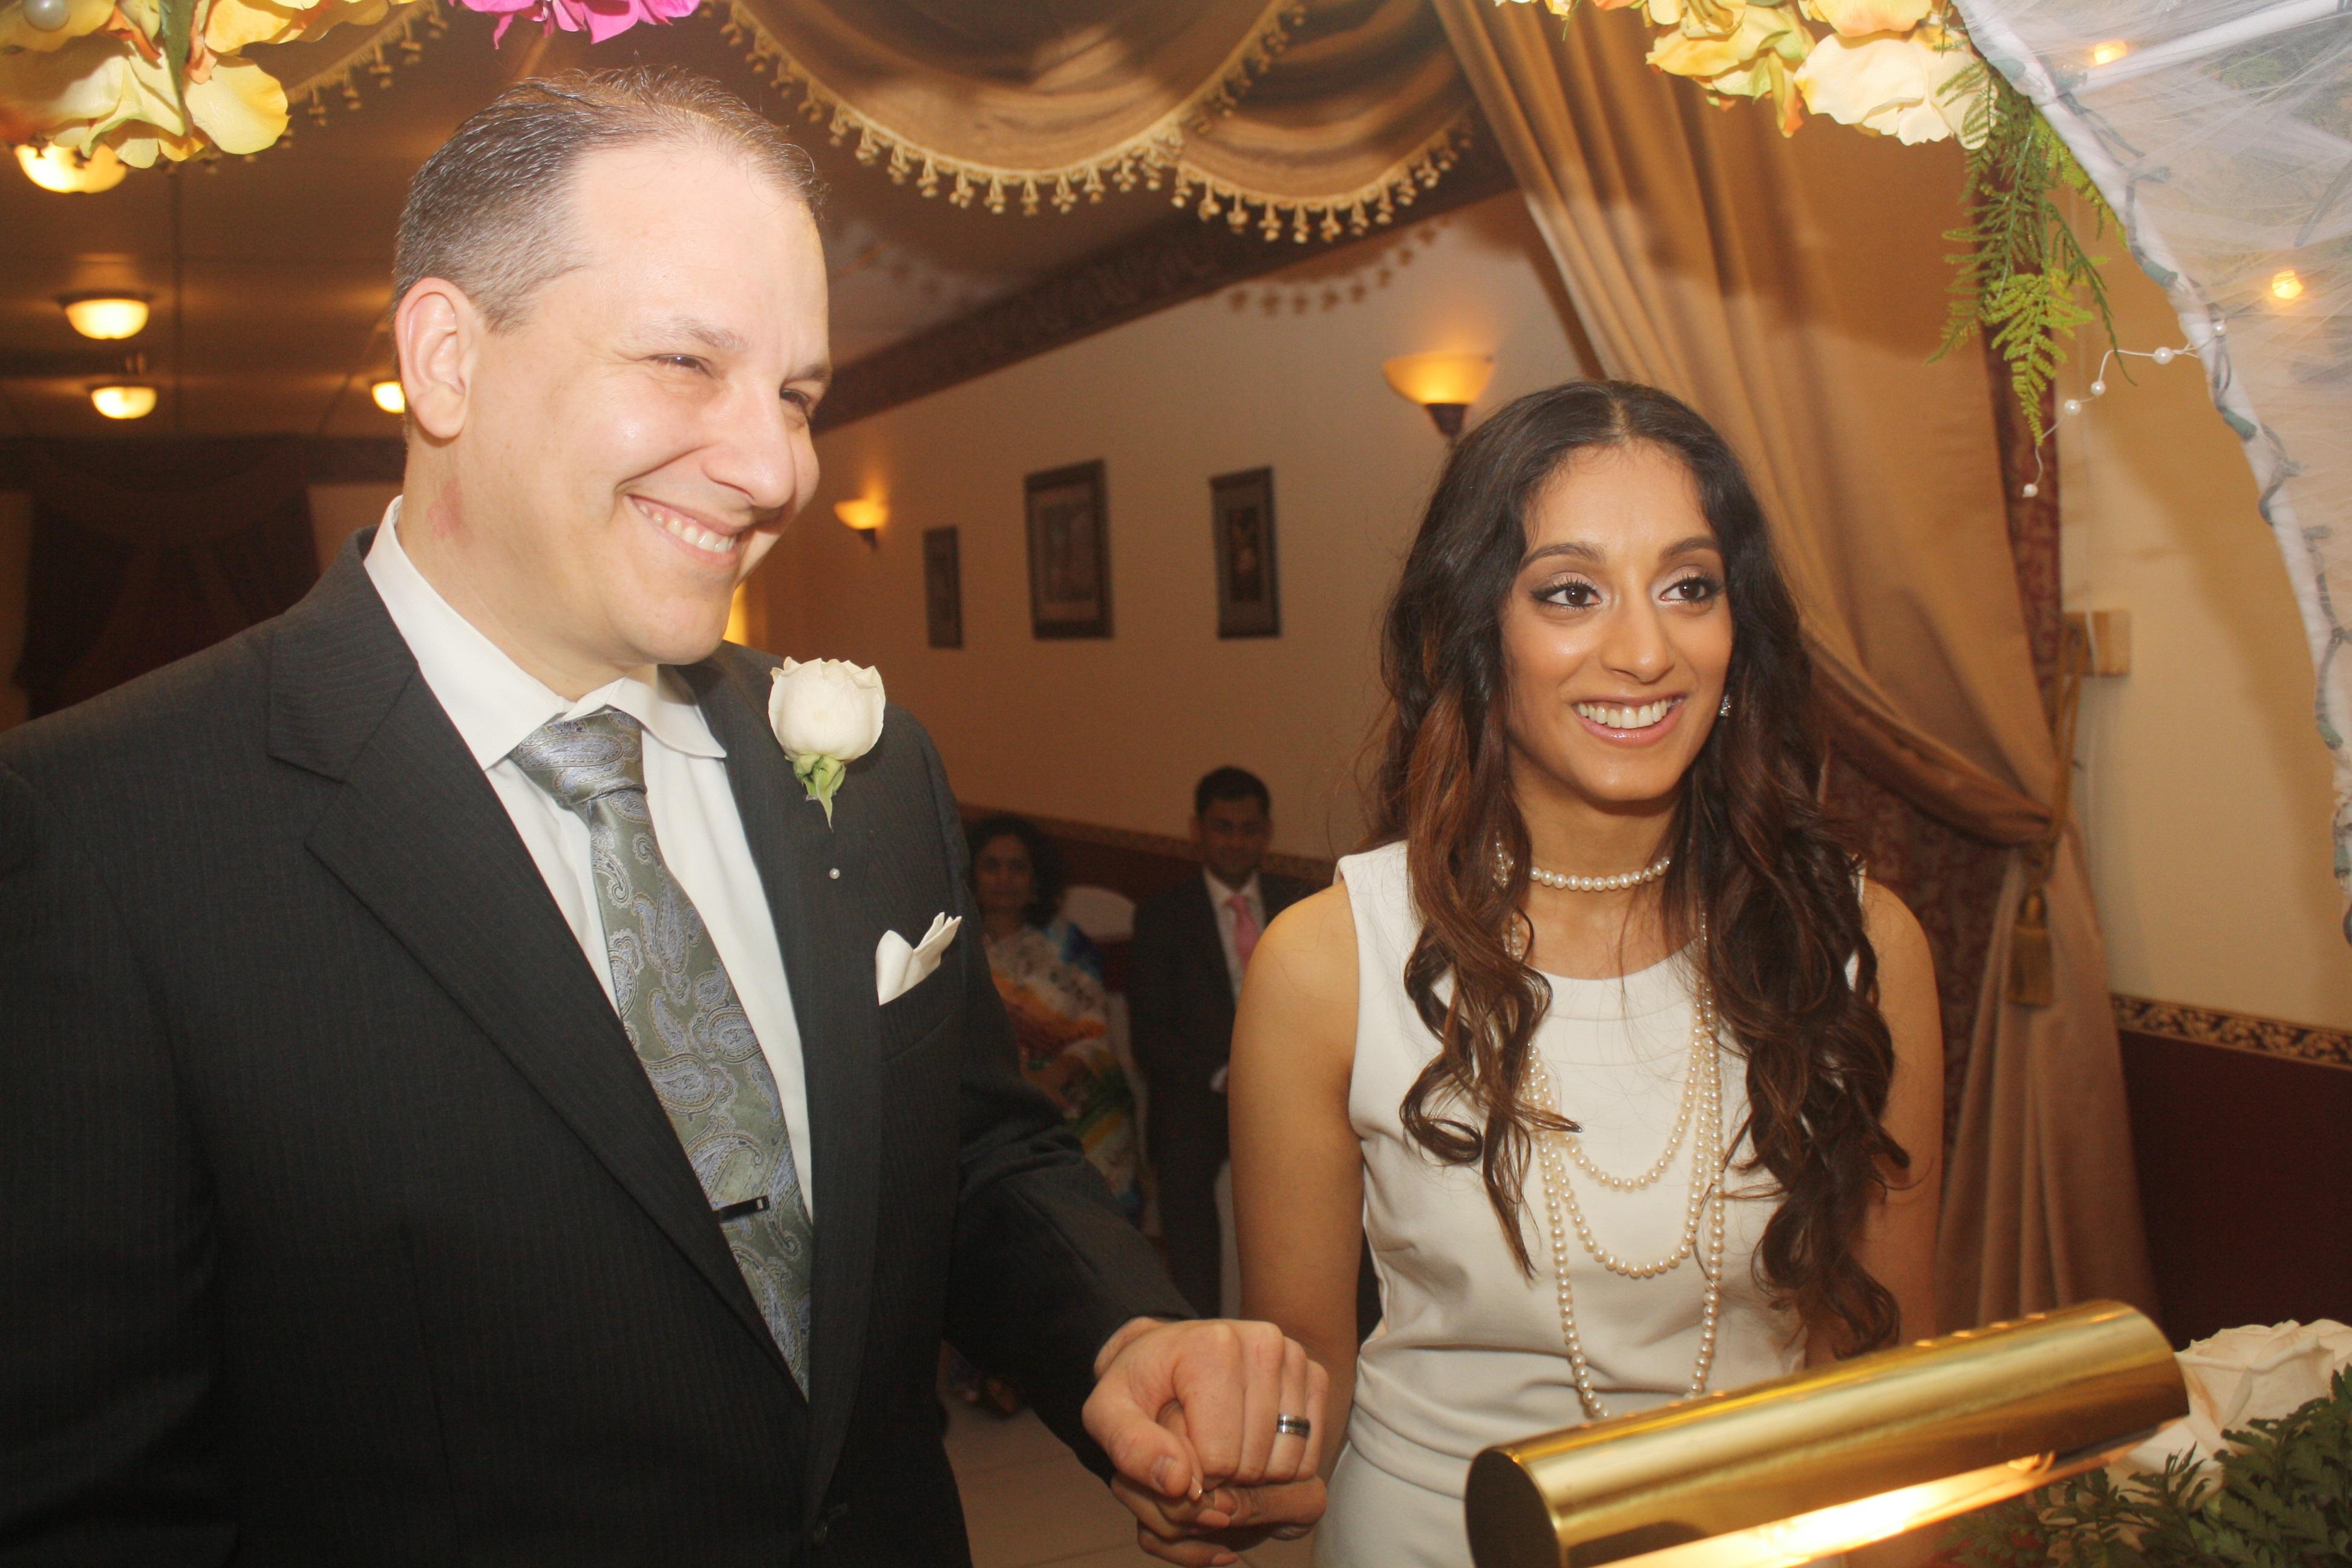 wedding chapel exchange vows